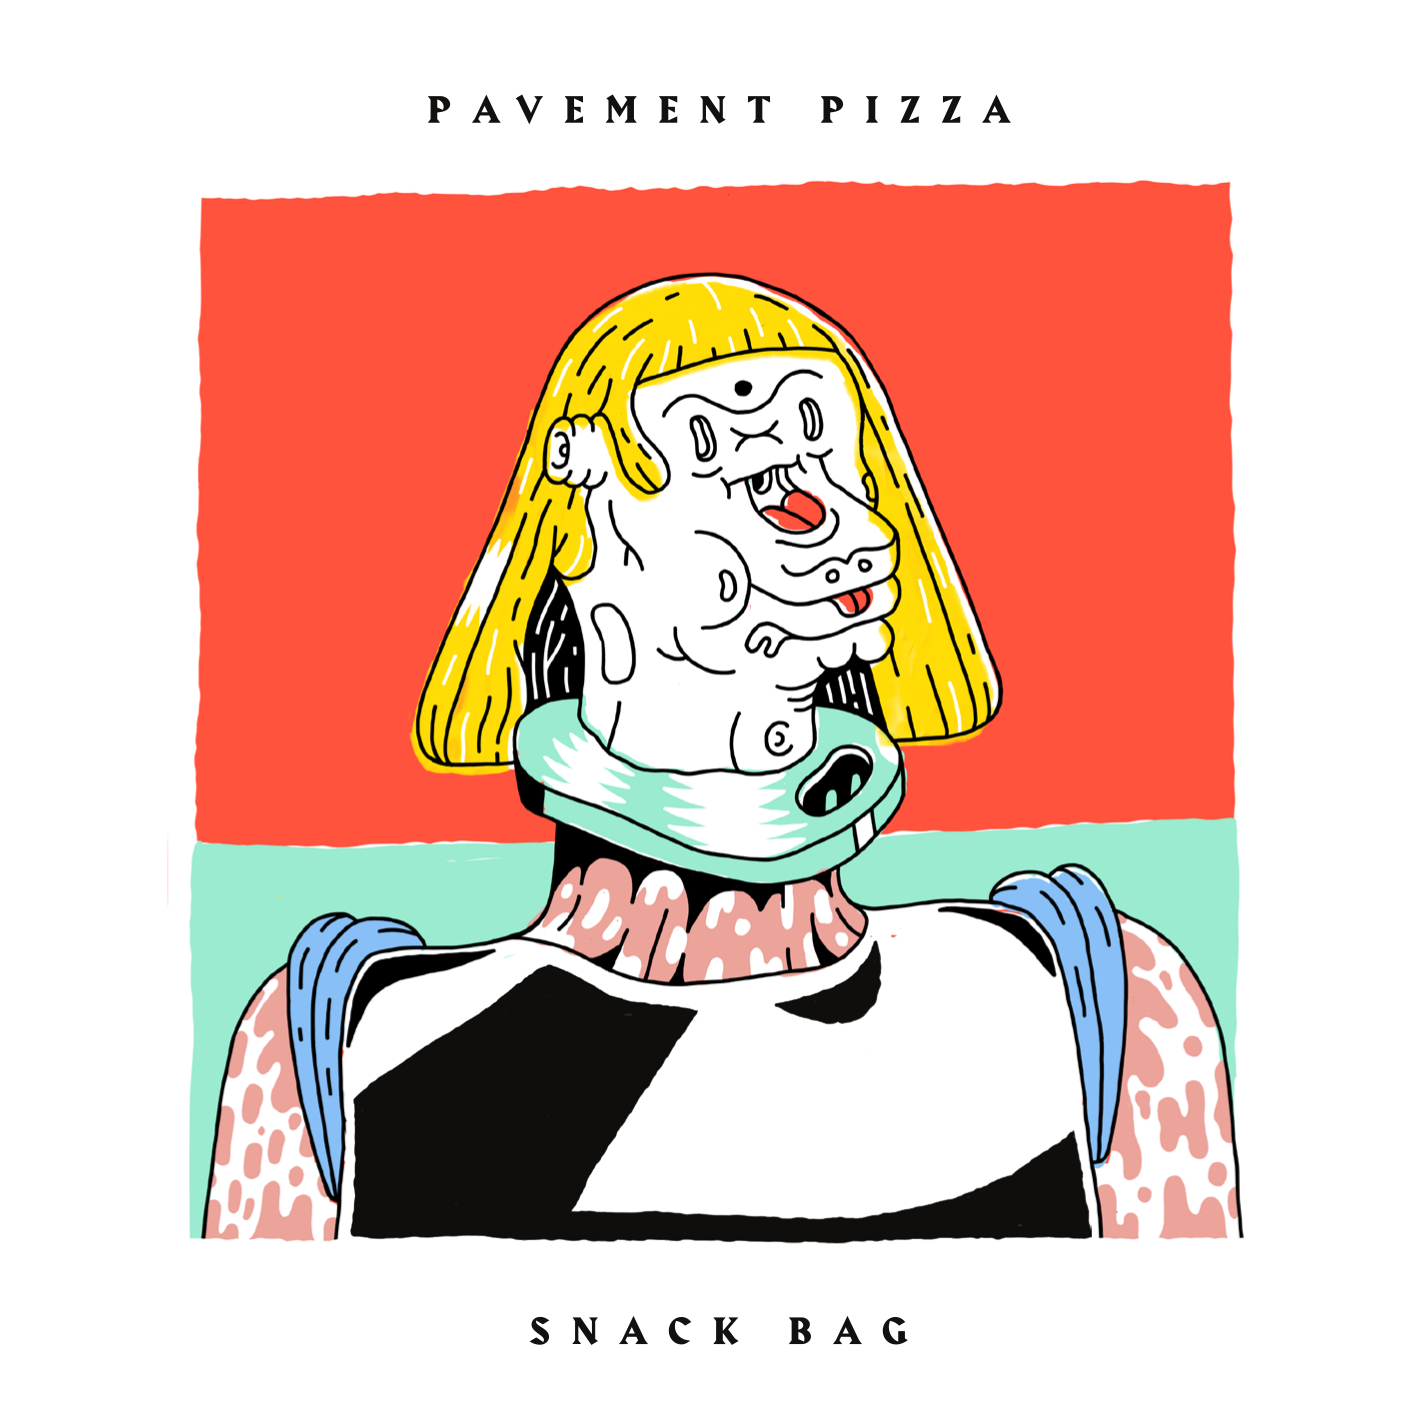 Pavement Pizza - Snack Bag CD